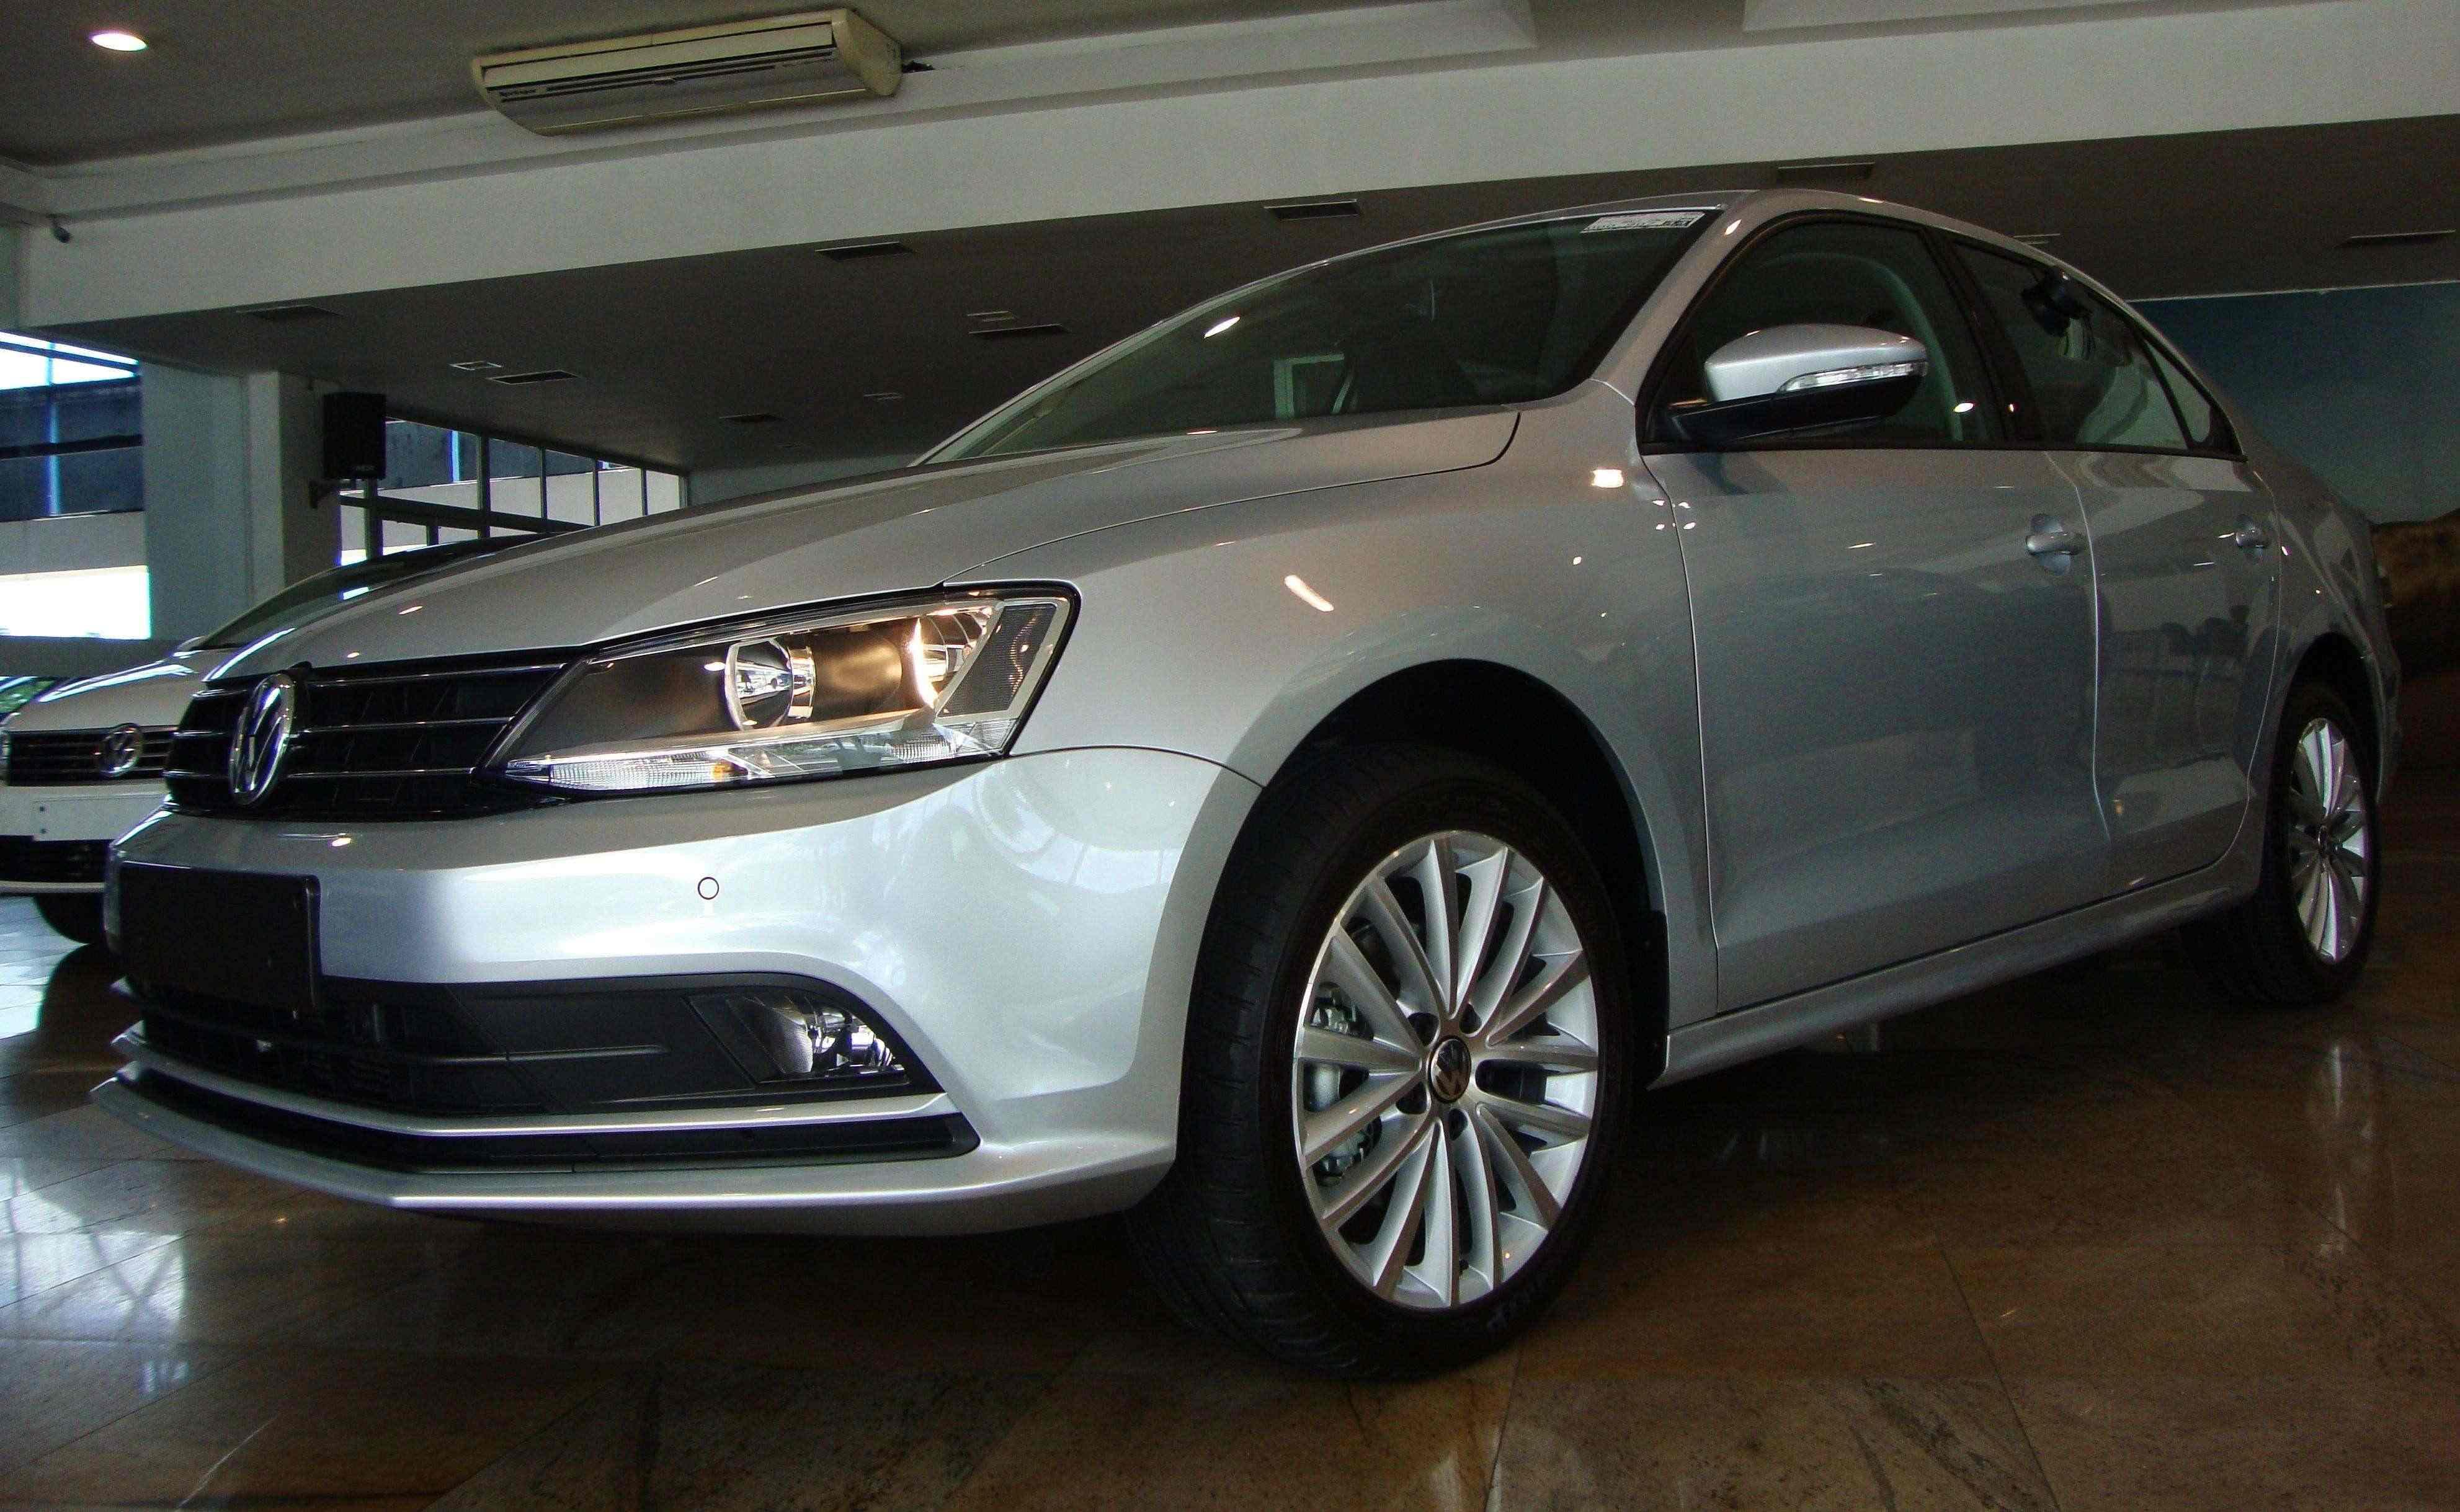 VW Jetta 2016: motor 1.4 TSI rende alta performance e reduz consumo